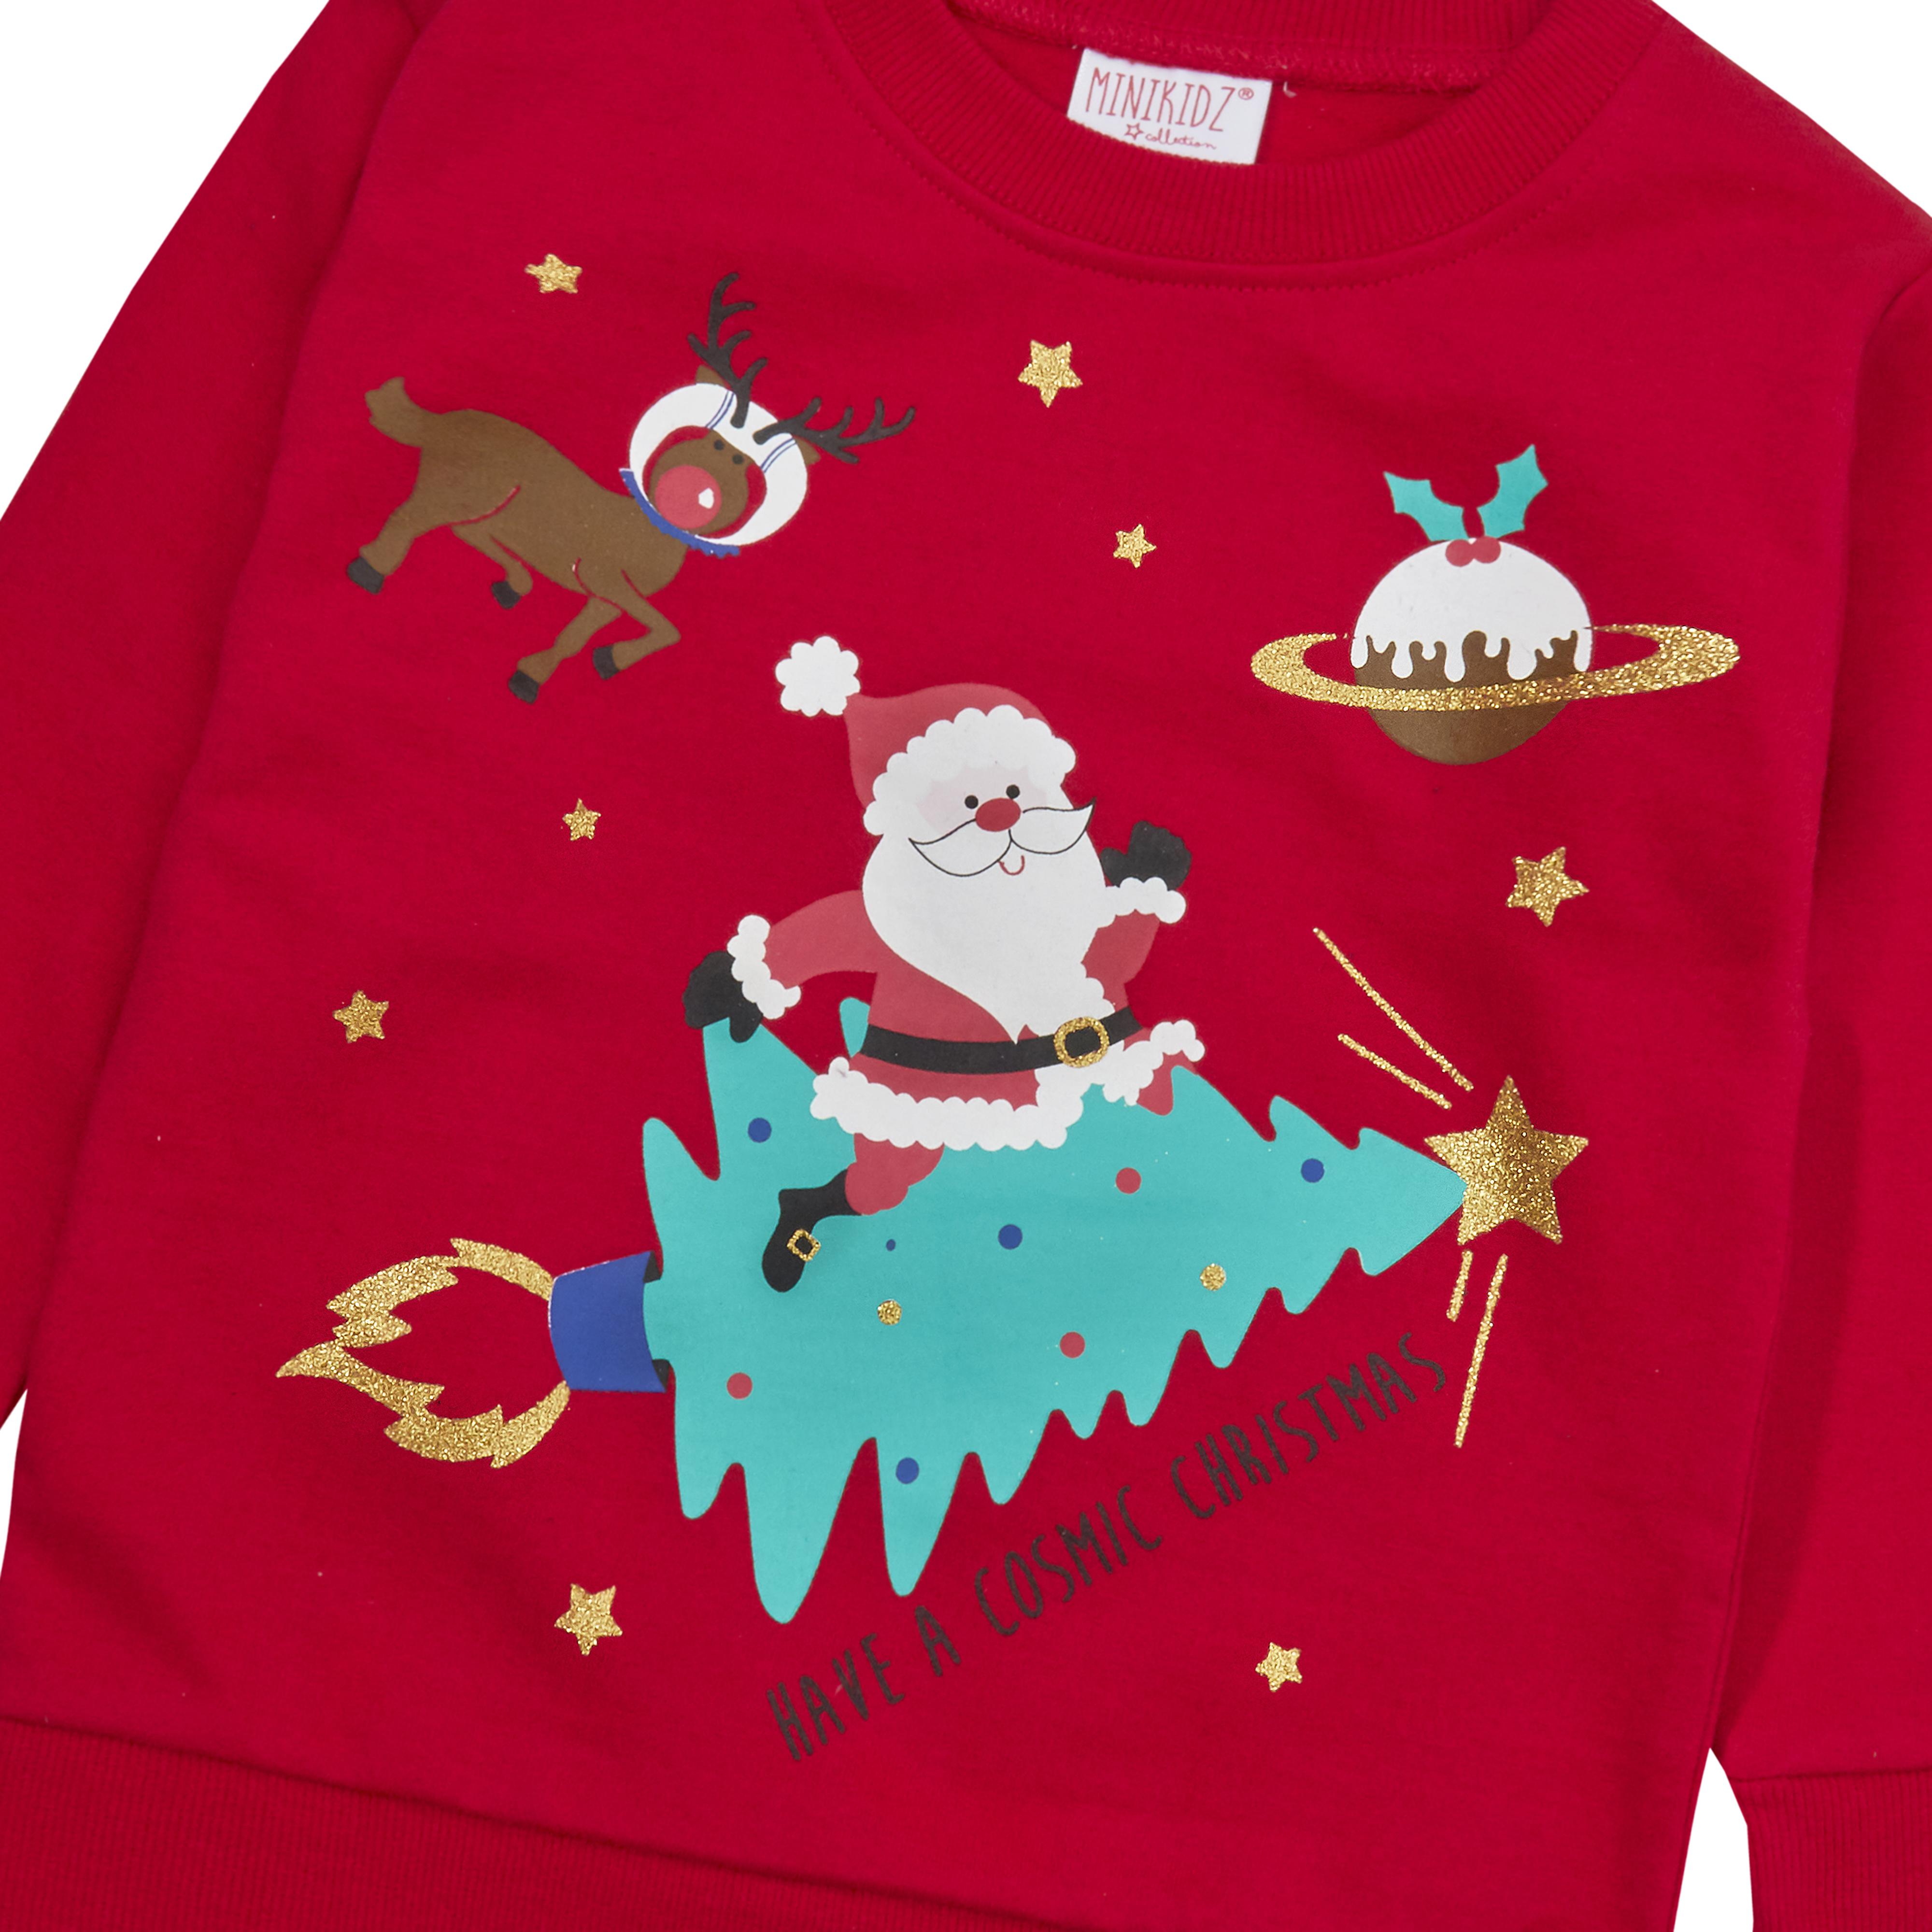 Childrens-Kids-Boys-Girls-Christmas-Xmas-Jumper-Sweatshirt-Rudolph-Glitter-Warm thumbnail 15